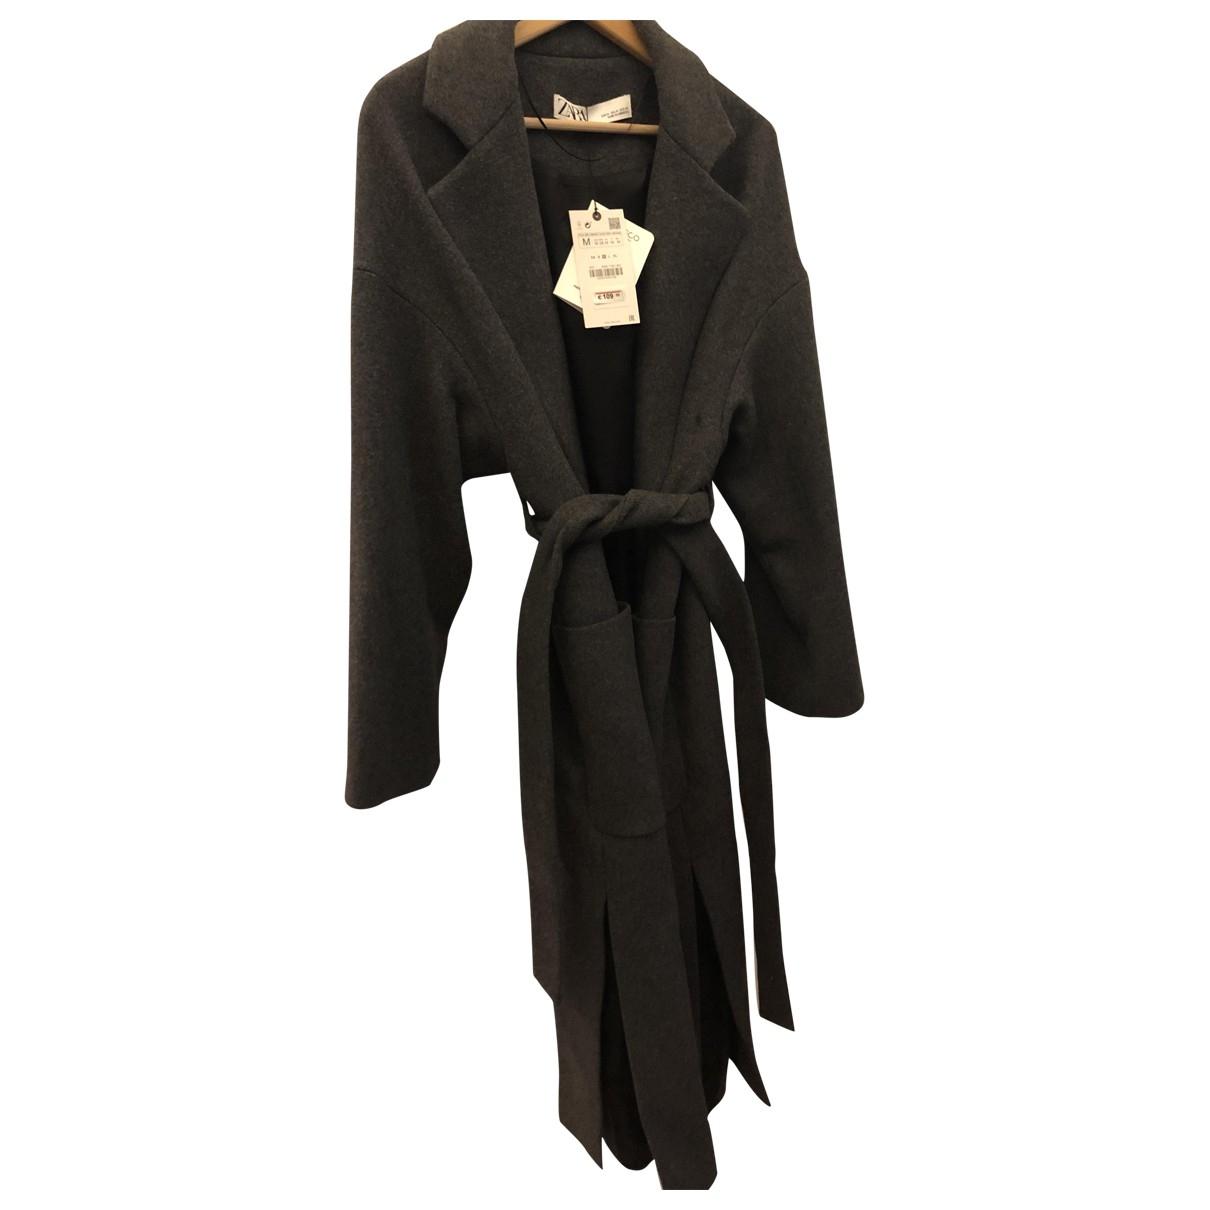 Zara \N Grey Wool coat for Women M International